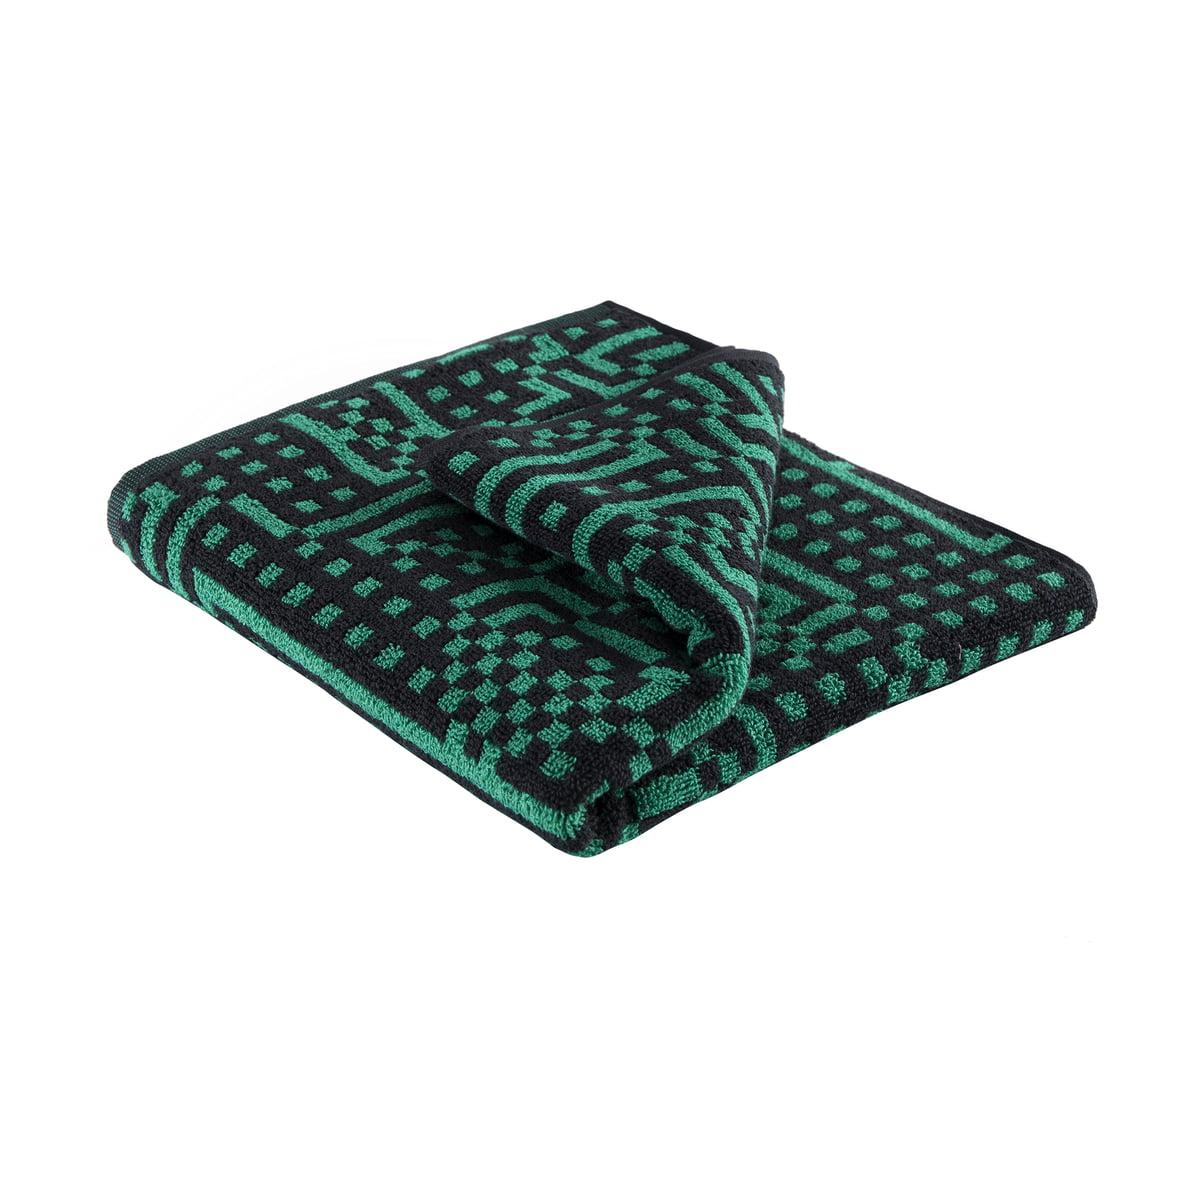 Zuzunaga - Route Black and Green Handtuch, 50 × 100 cm | Bad > Handtücher | Grün | Zuzunaga